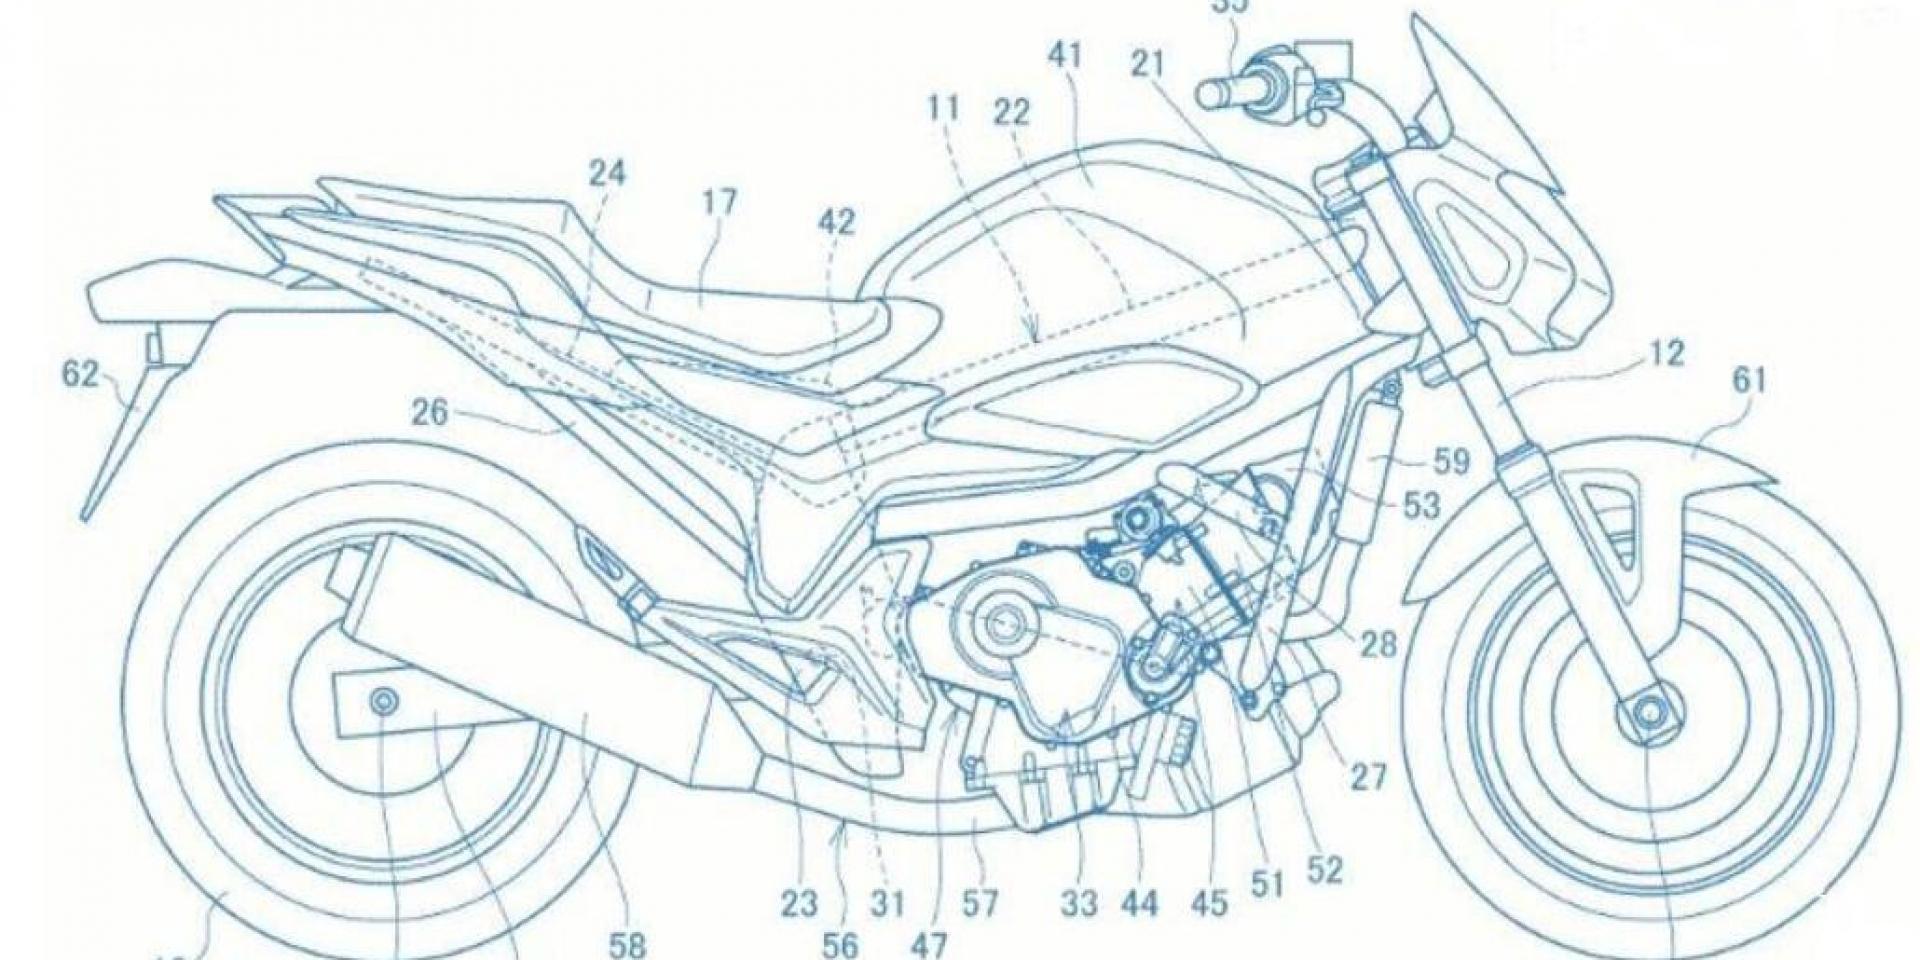 Honda新引擎專利申請 可能是800或850cc!